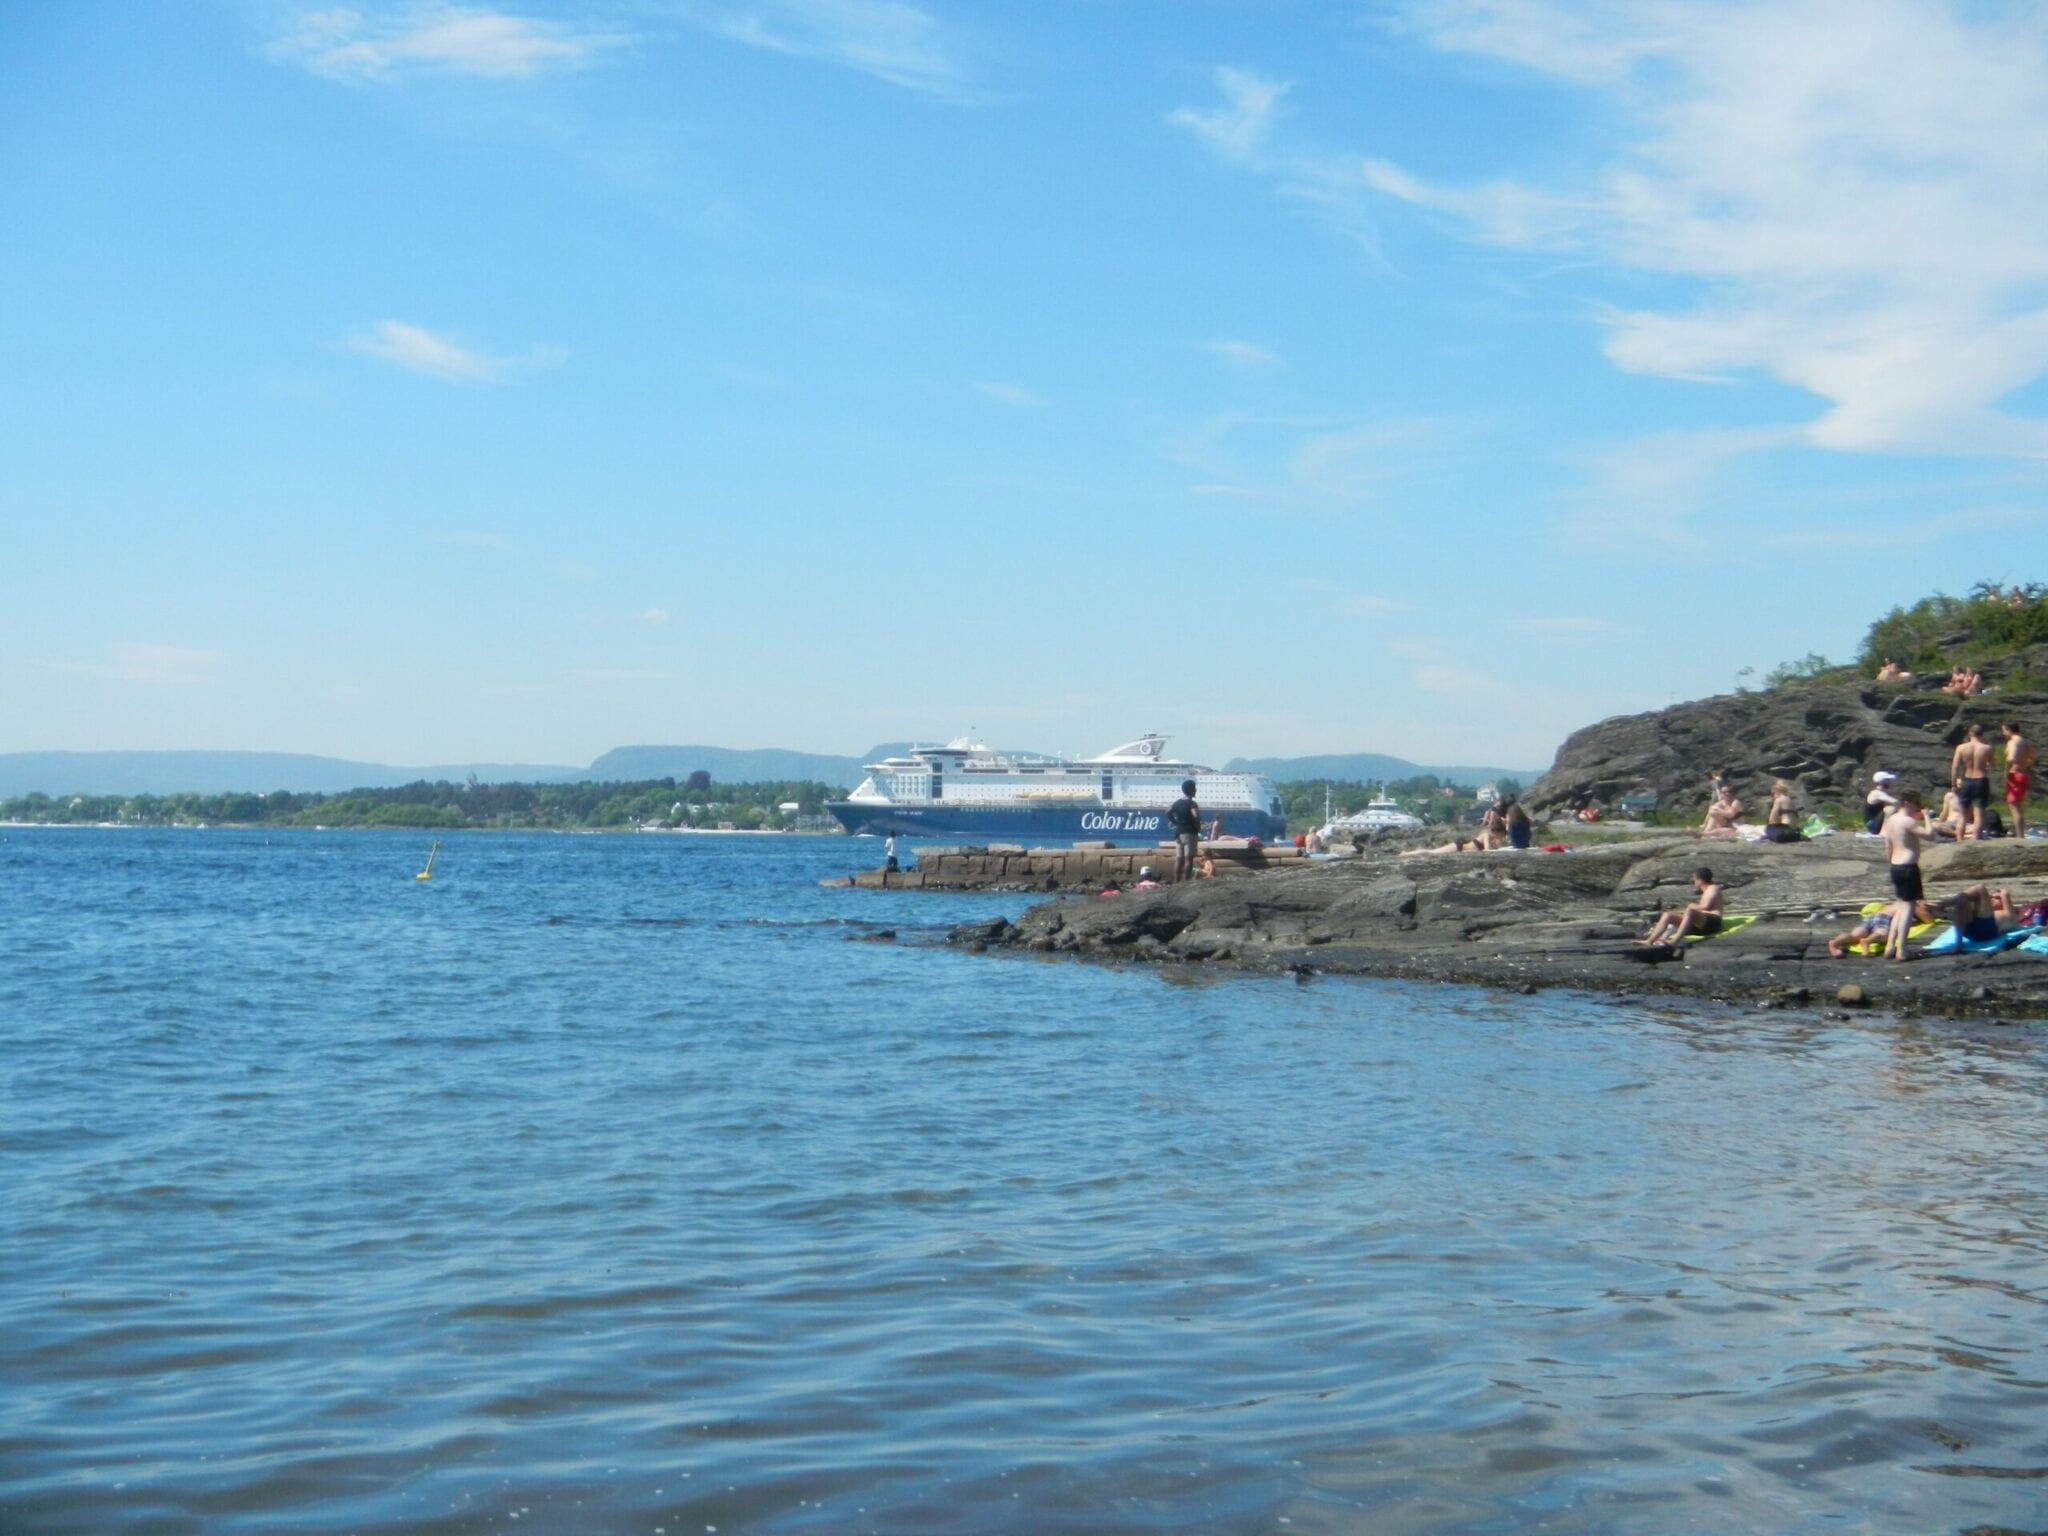 Kayaking along the islands